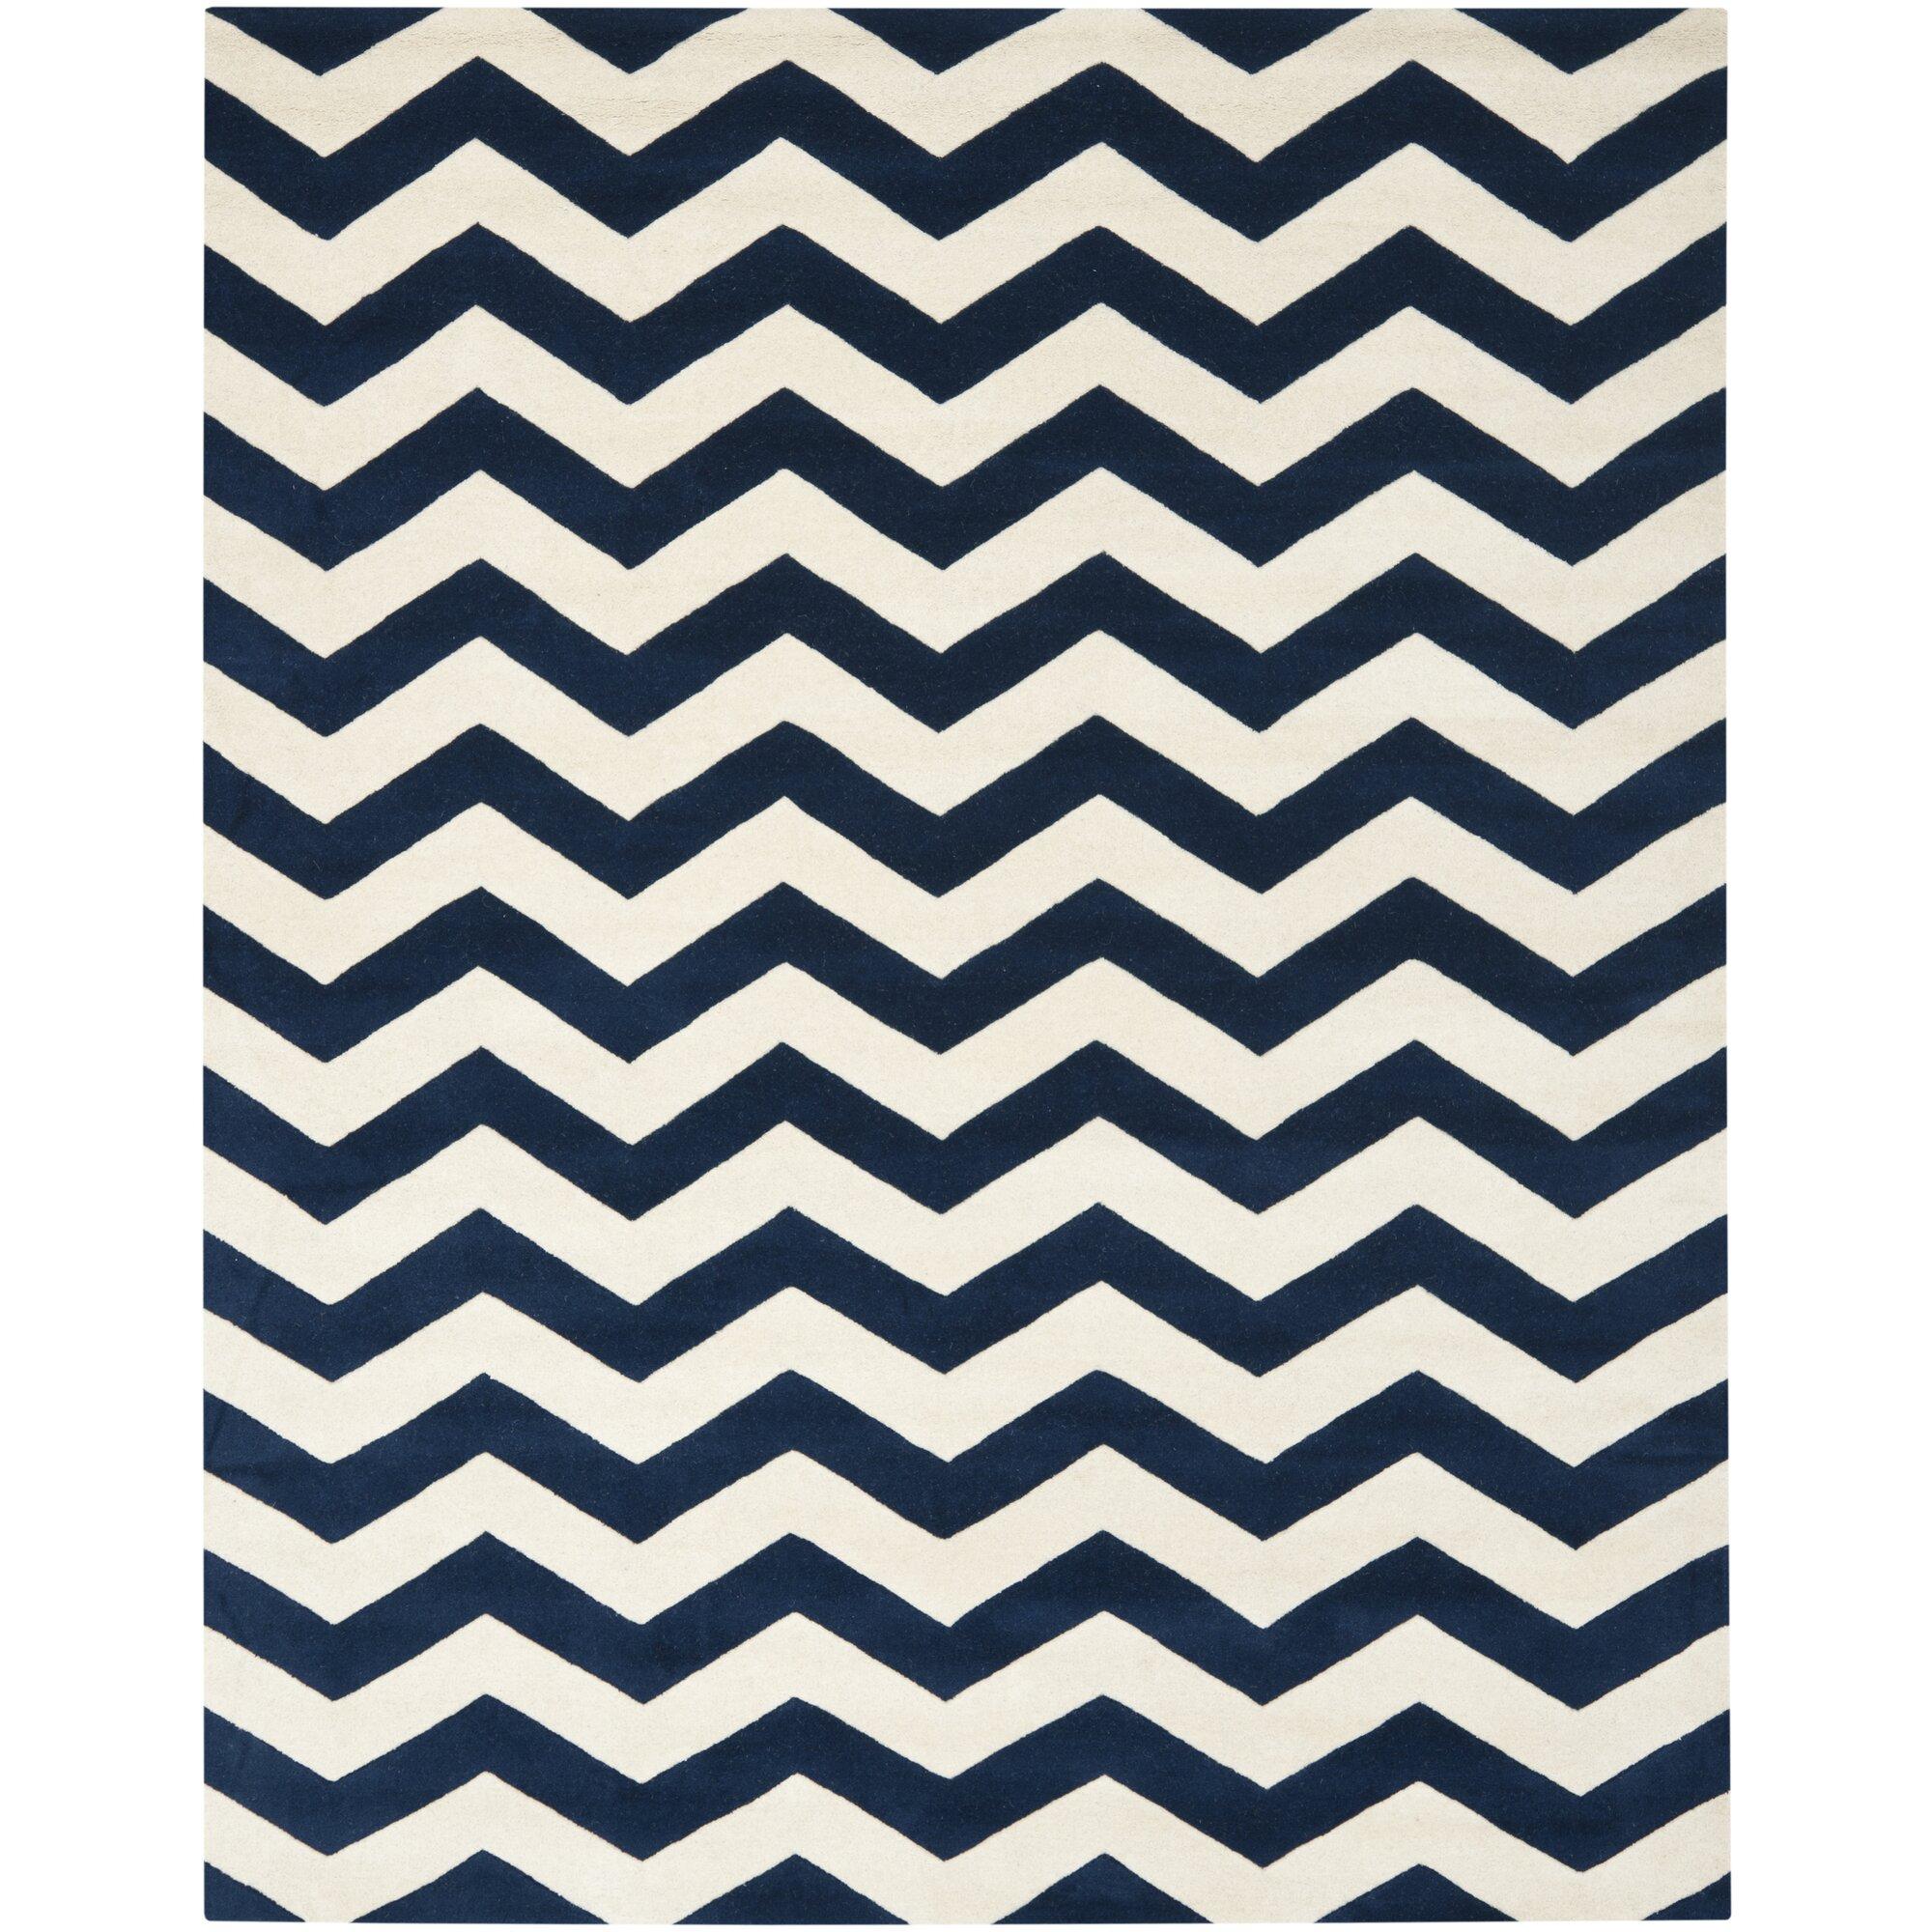 blue chevron area rug  rugs ideas - chevron area rugs